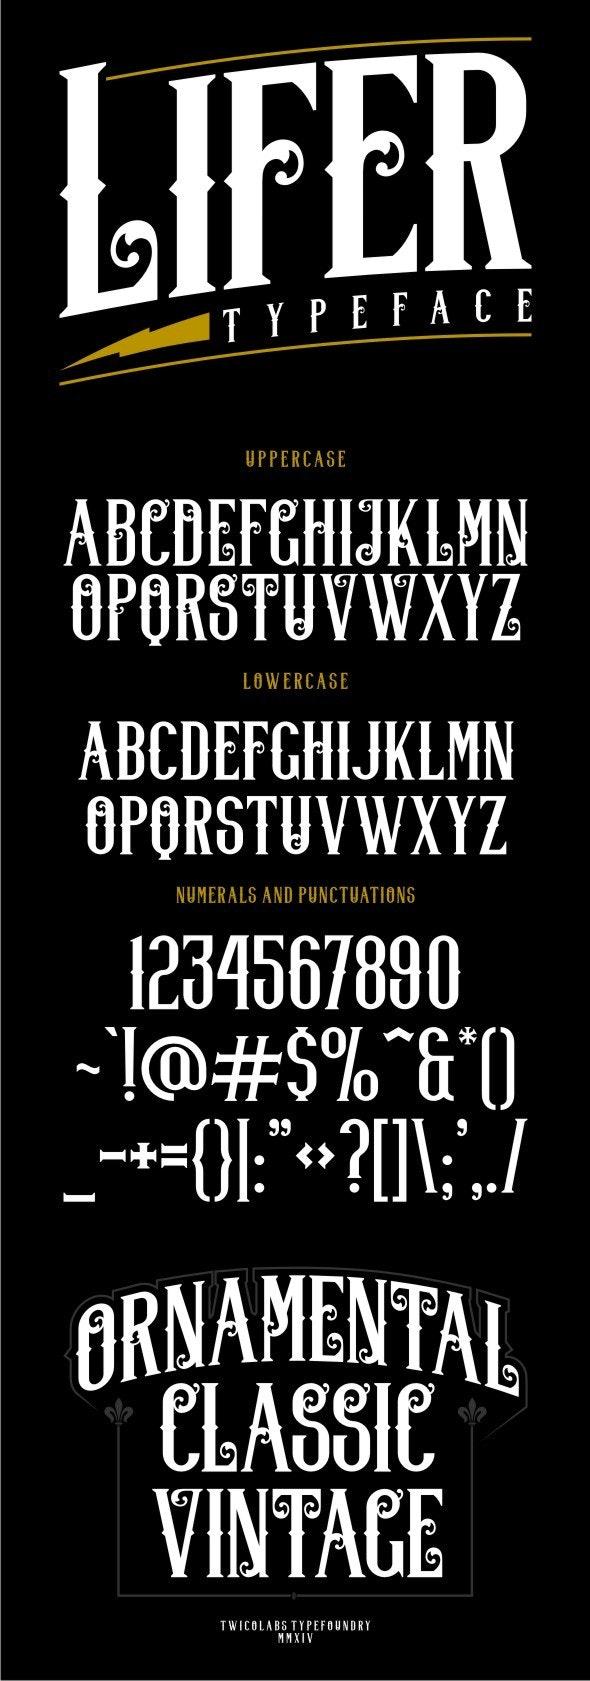 Lifer Typeface - Gothic Decorative